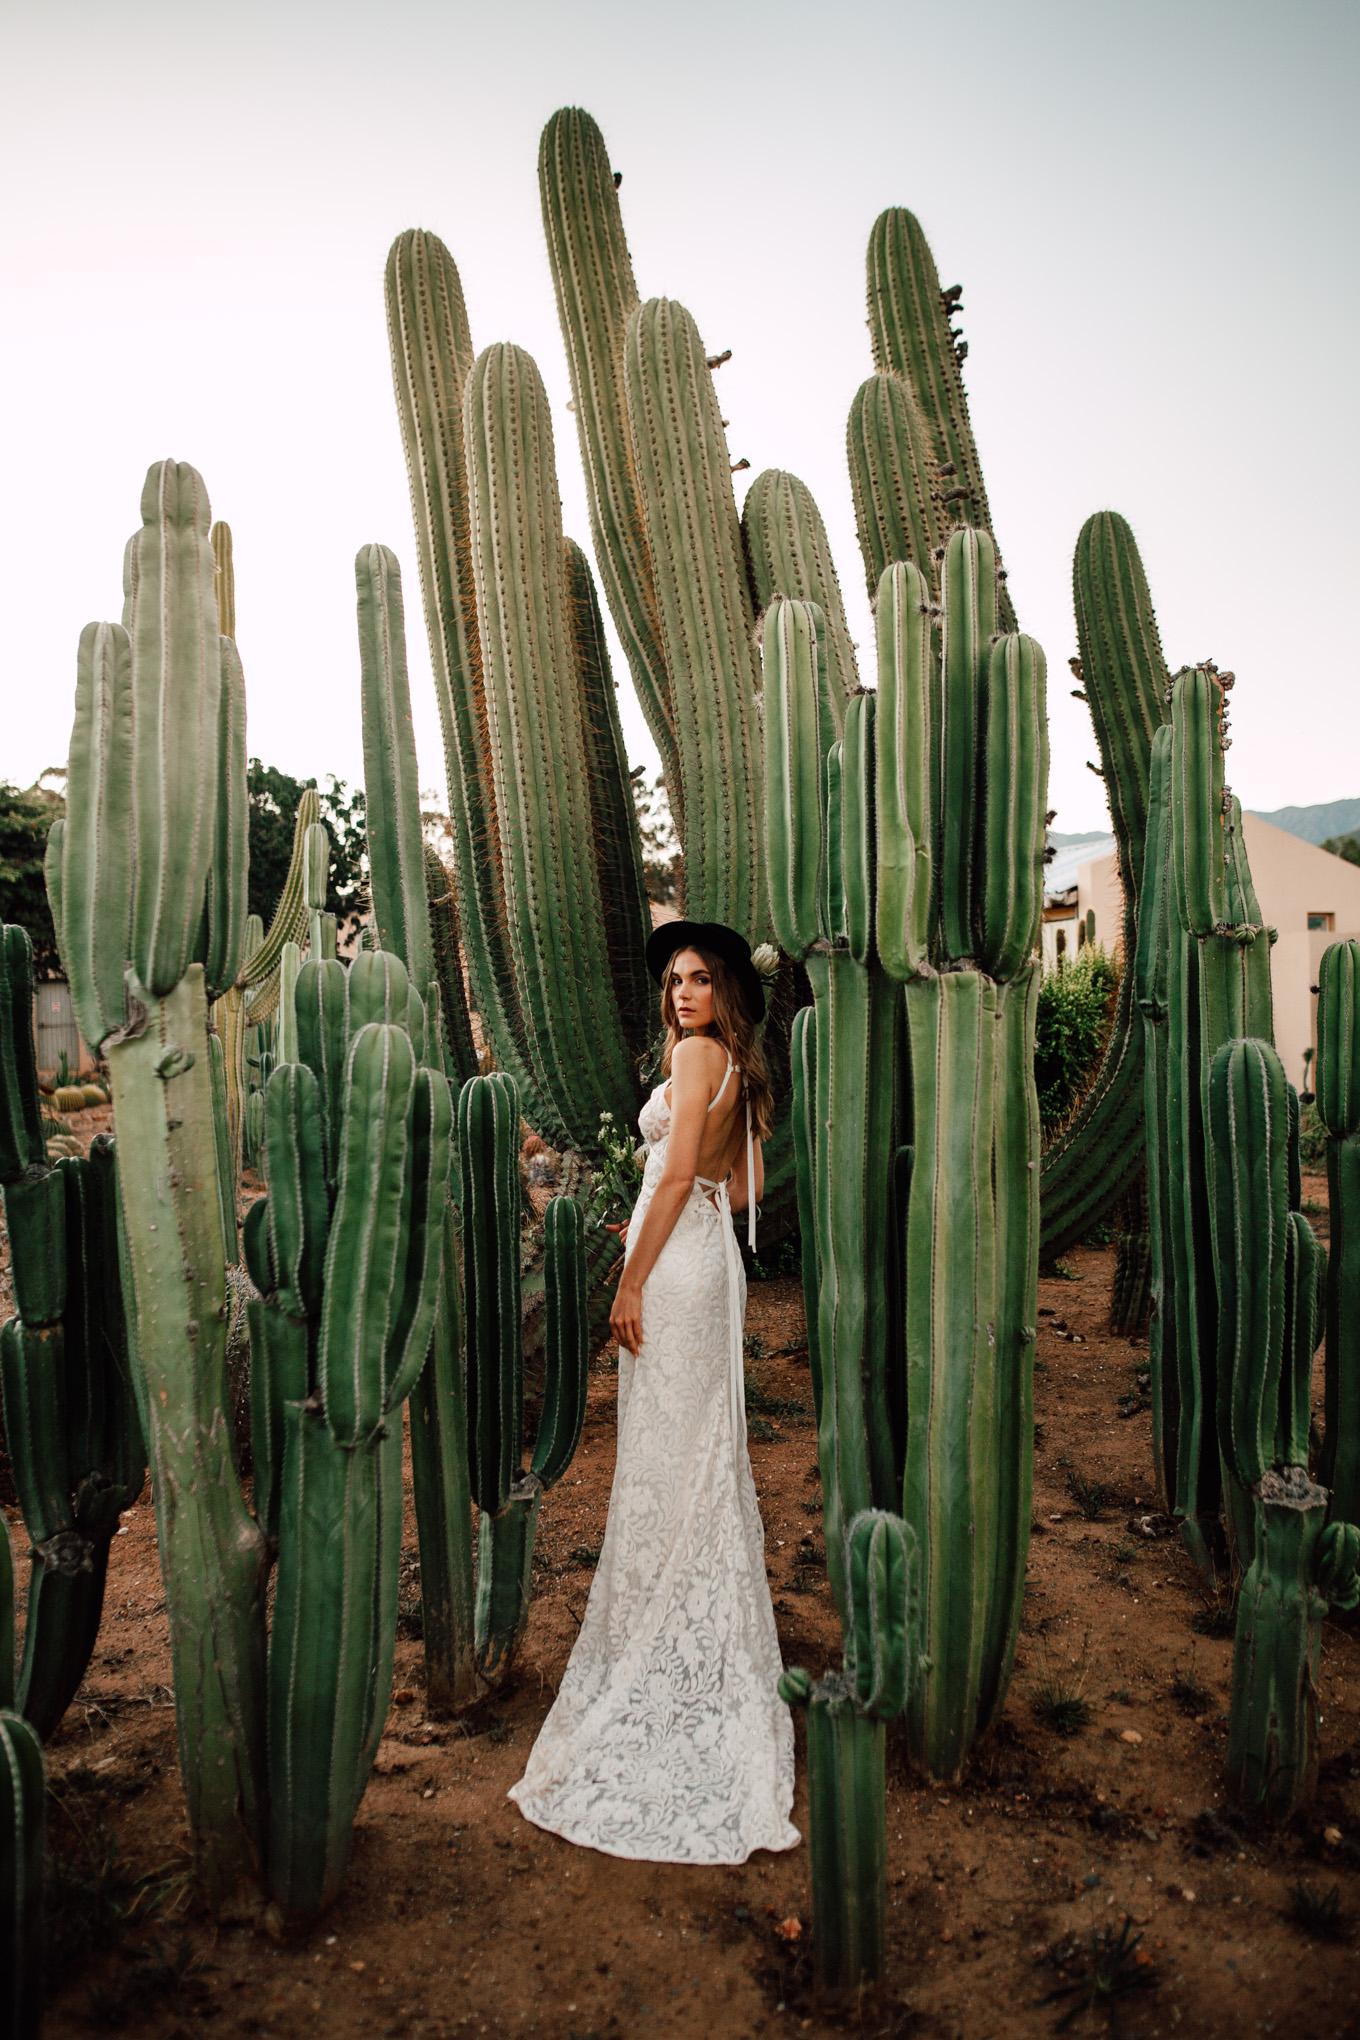 Cape-Town-Pia-Anna-Christian-Wedding-Photography-South-Africa-Bride-Cactus-32.jpg